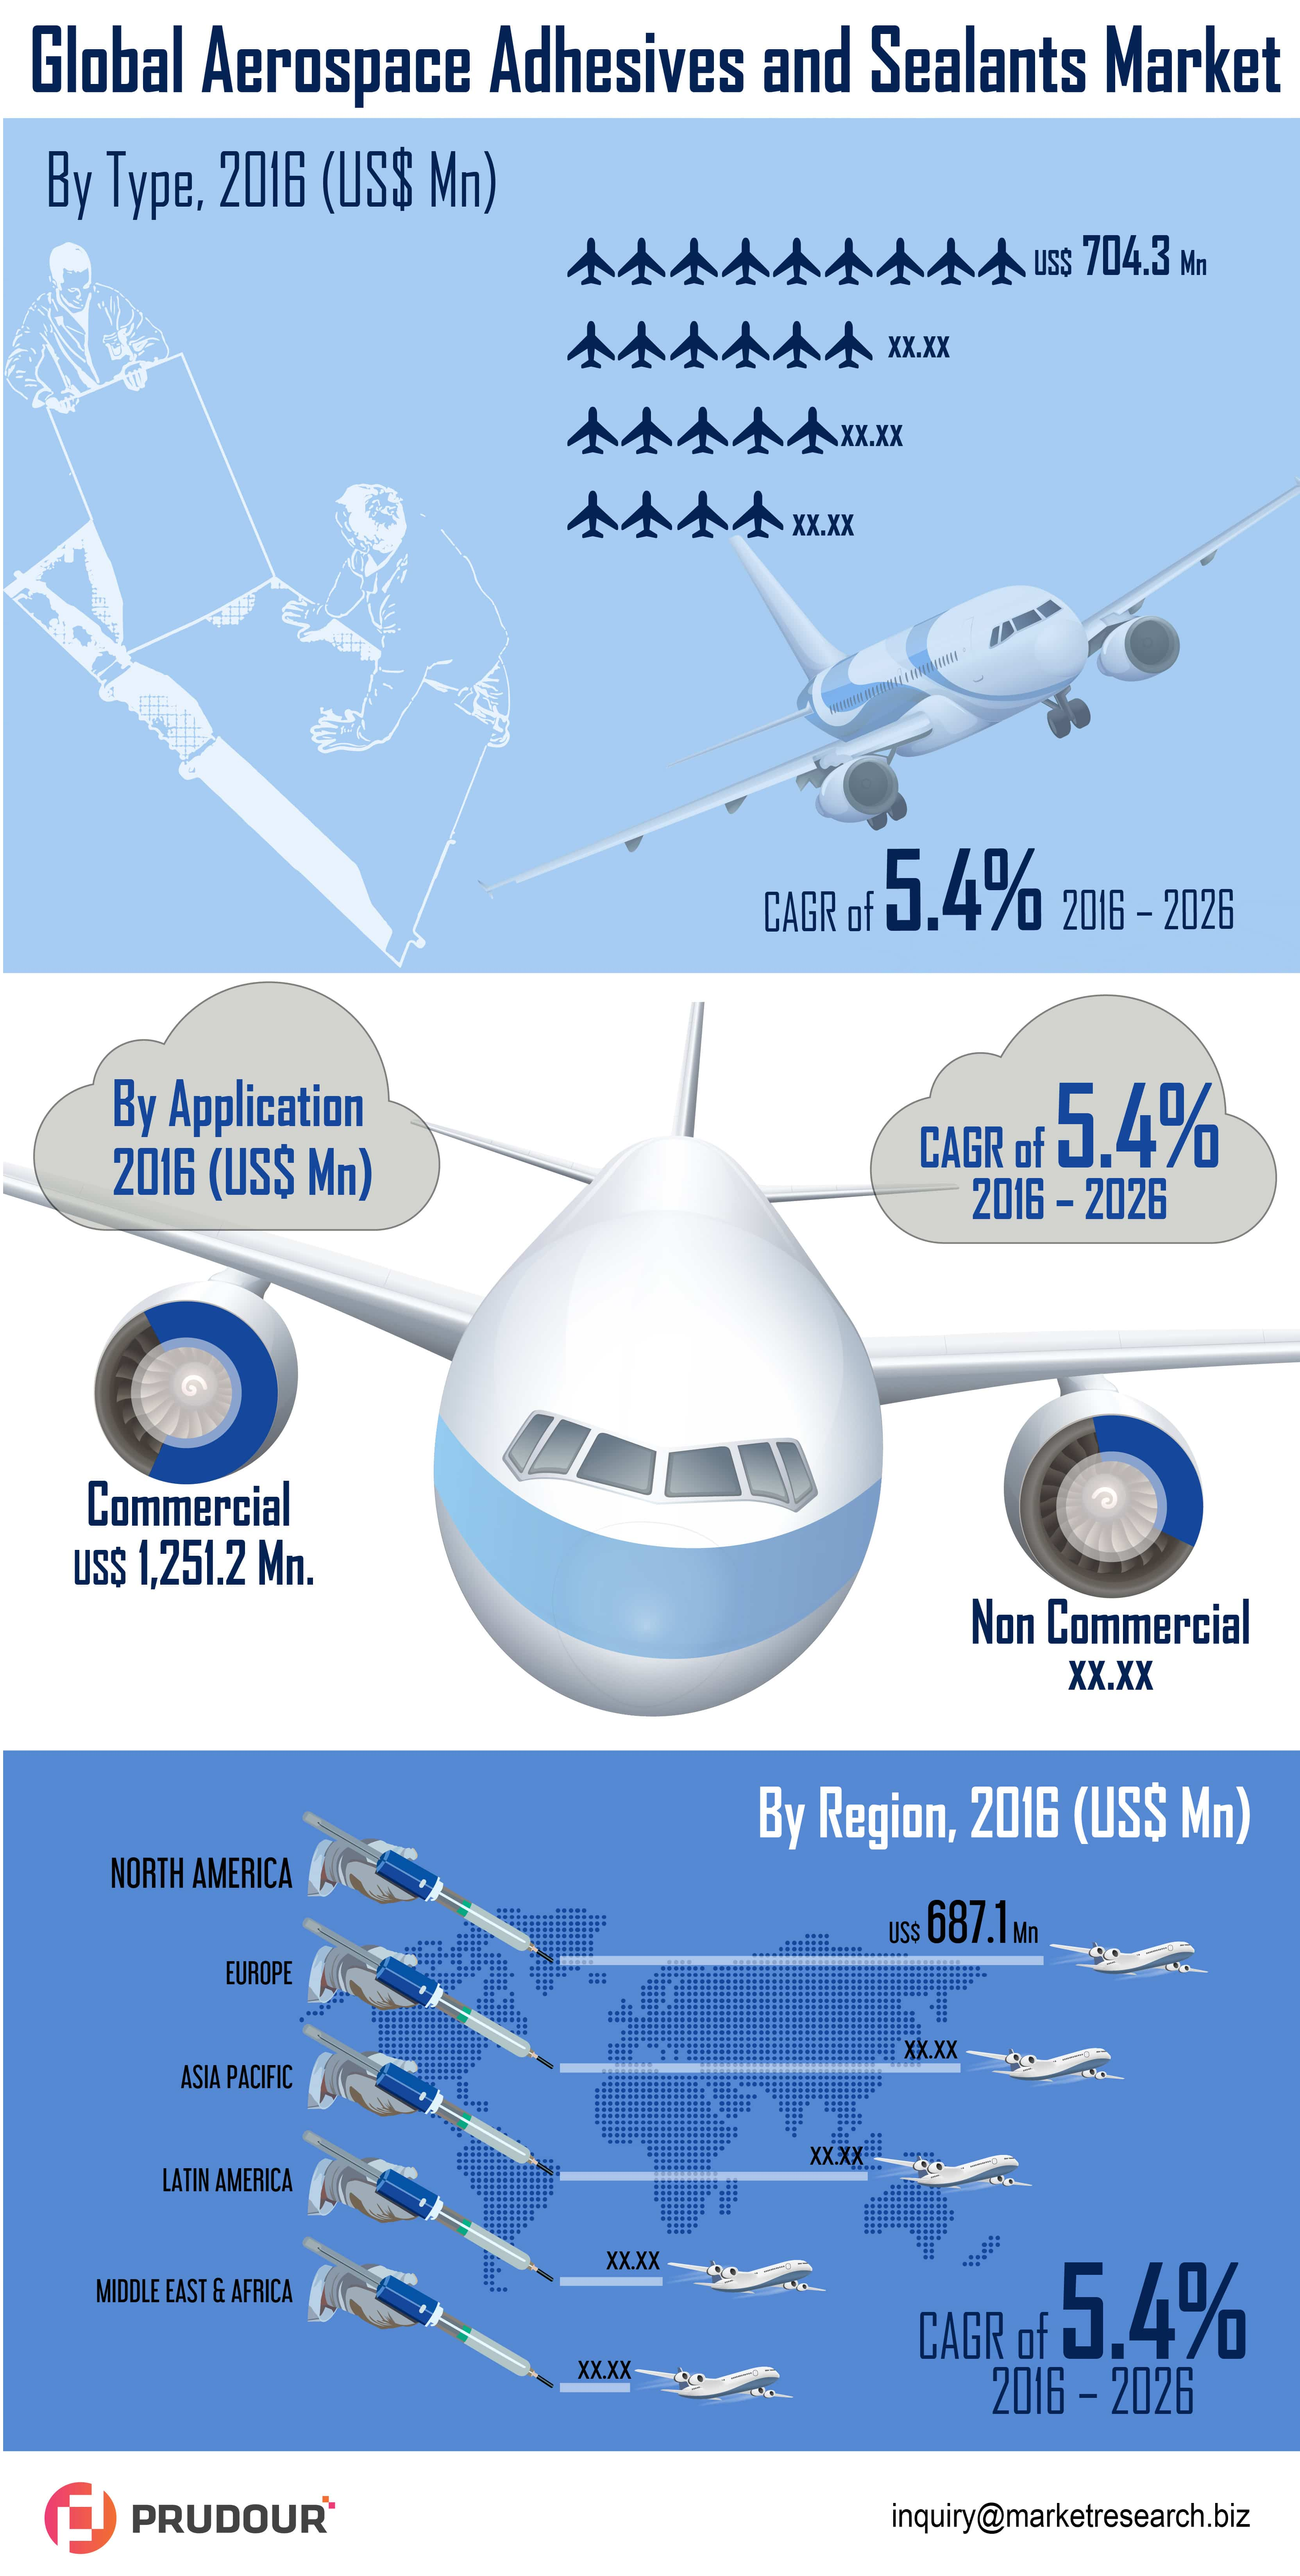 Aerospace Adhesives and Sealants Market